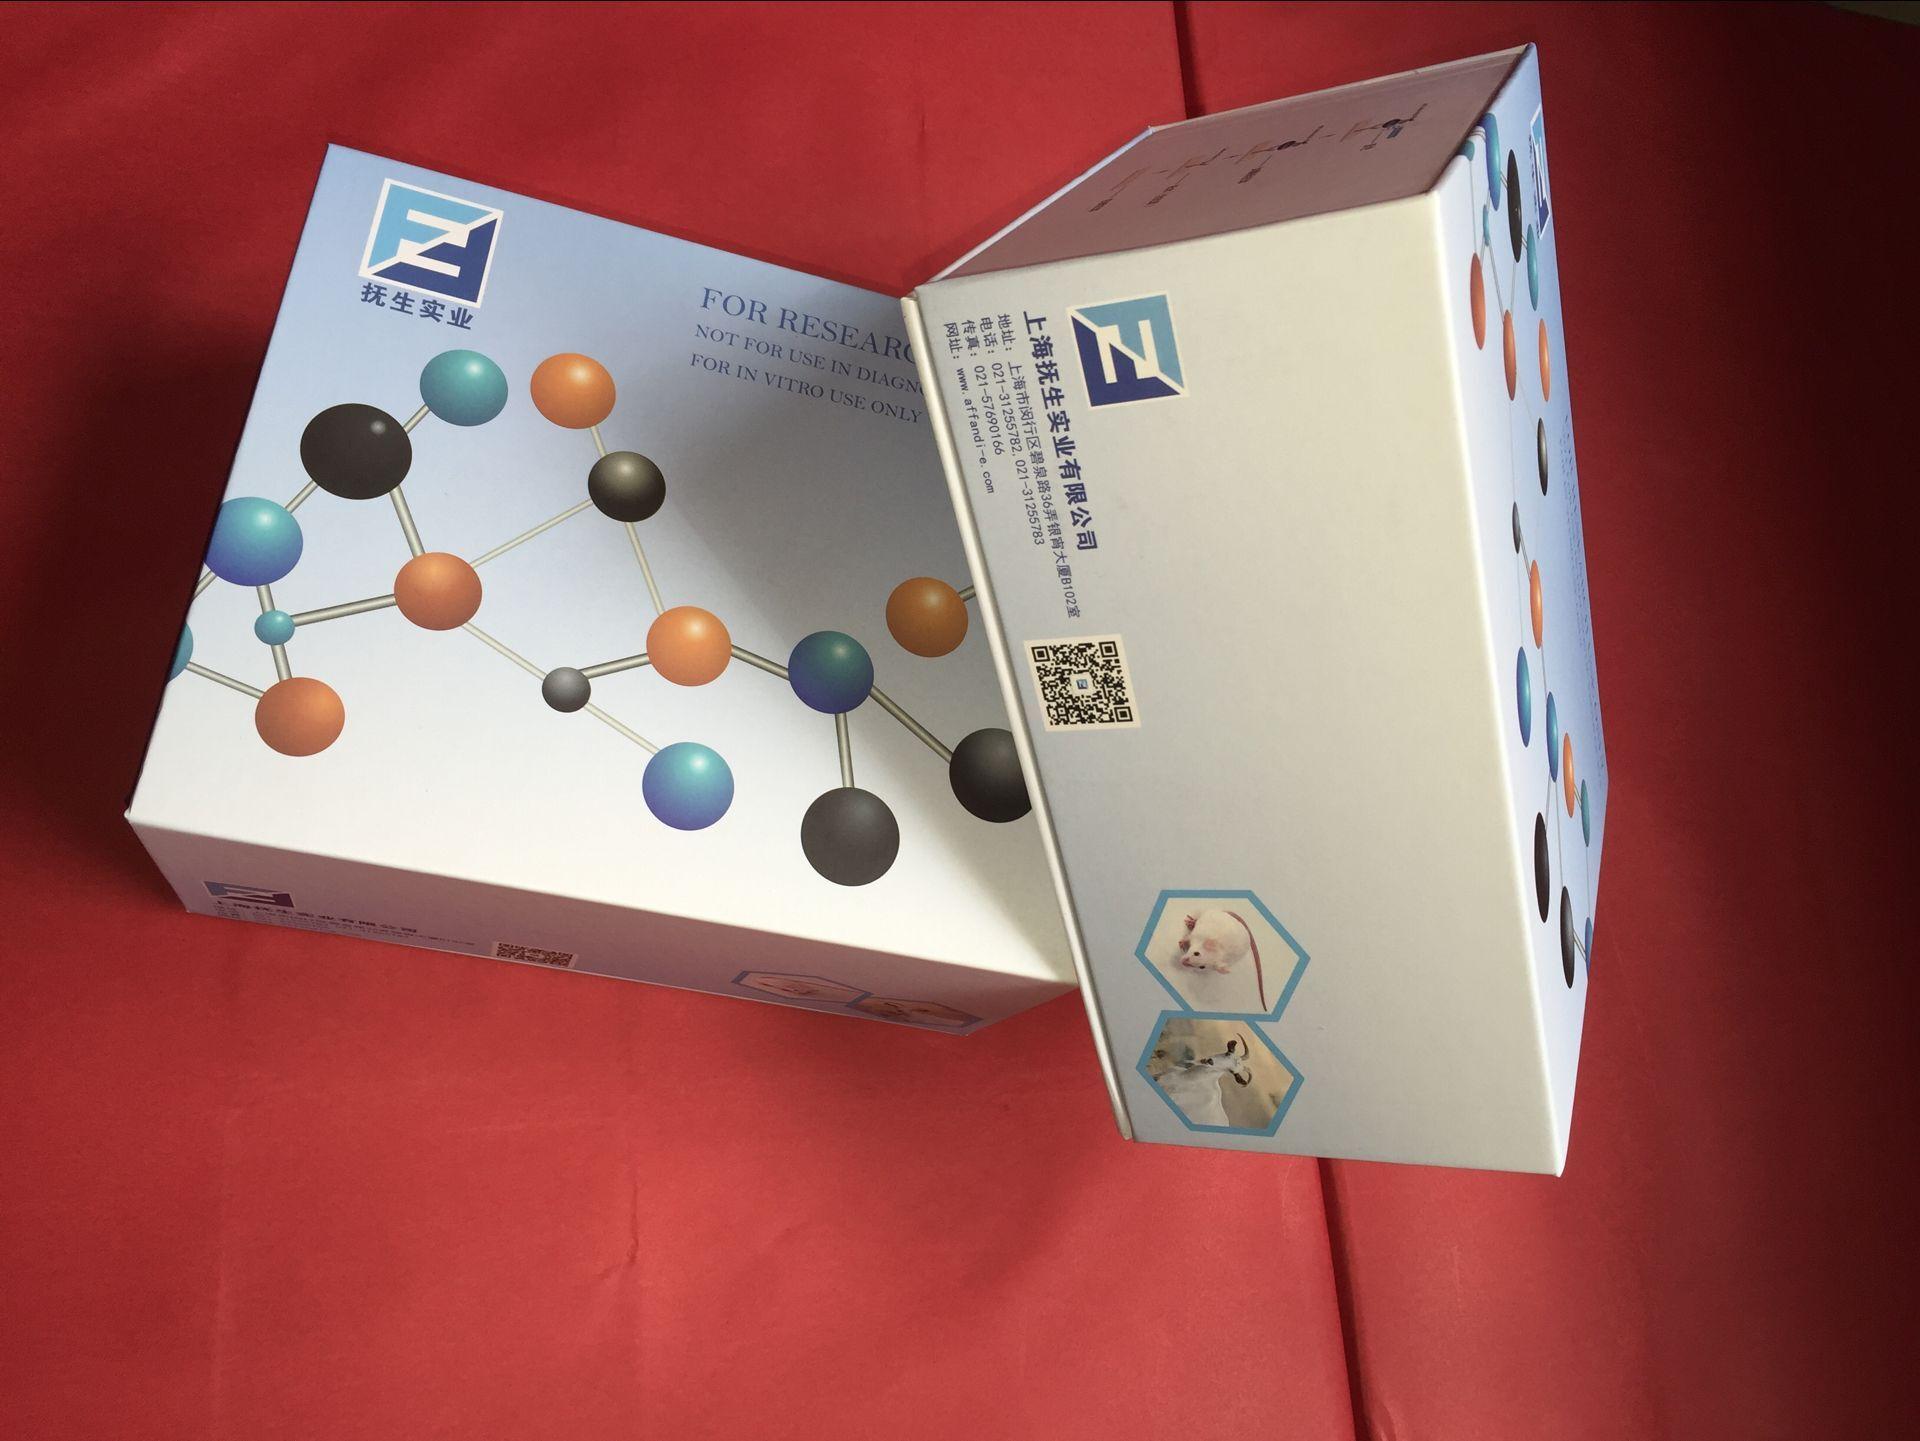 CA72-4 试剂盒品牌